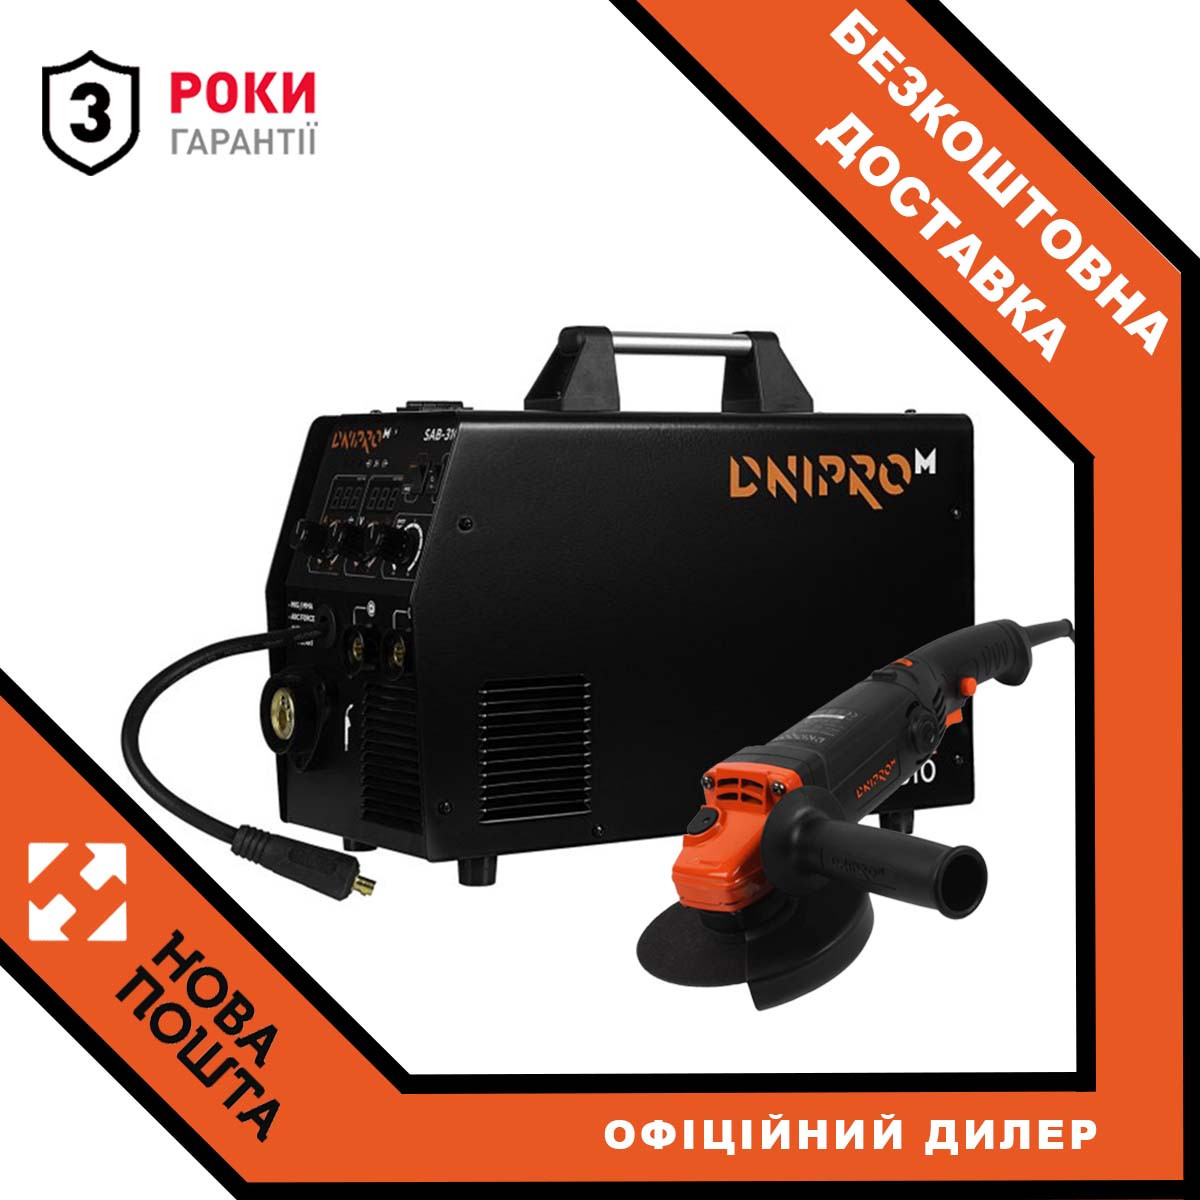 Інверторний Напівавтомат IGBT MIG/MMA Dnipro-M SAB-310 + Болгарка Dnipro-M GL-125S